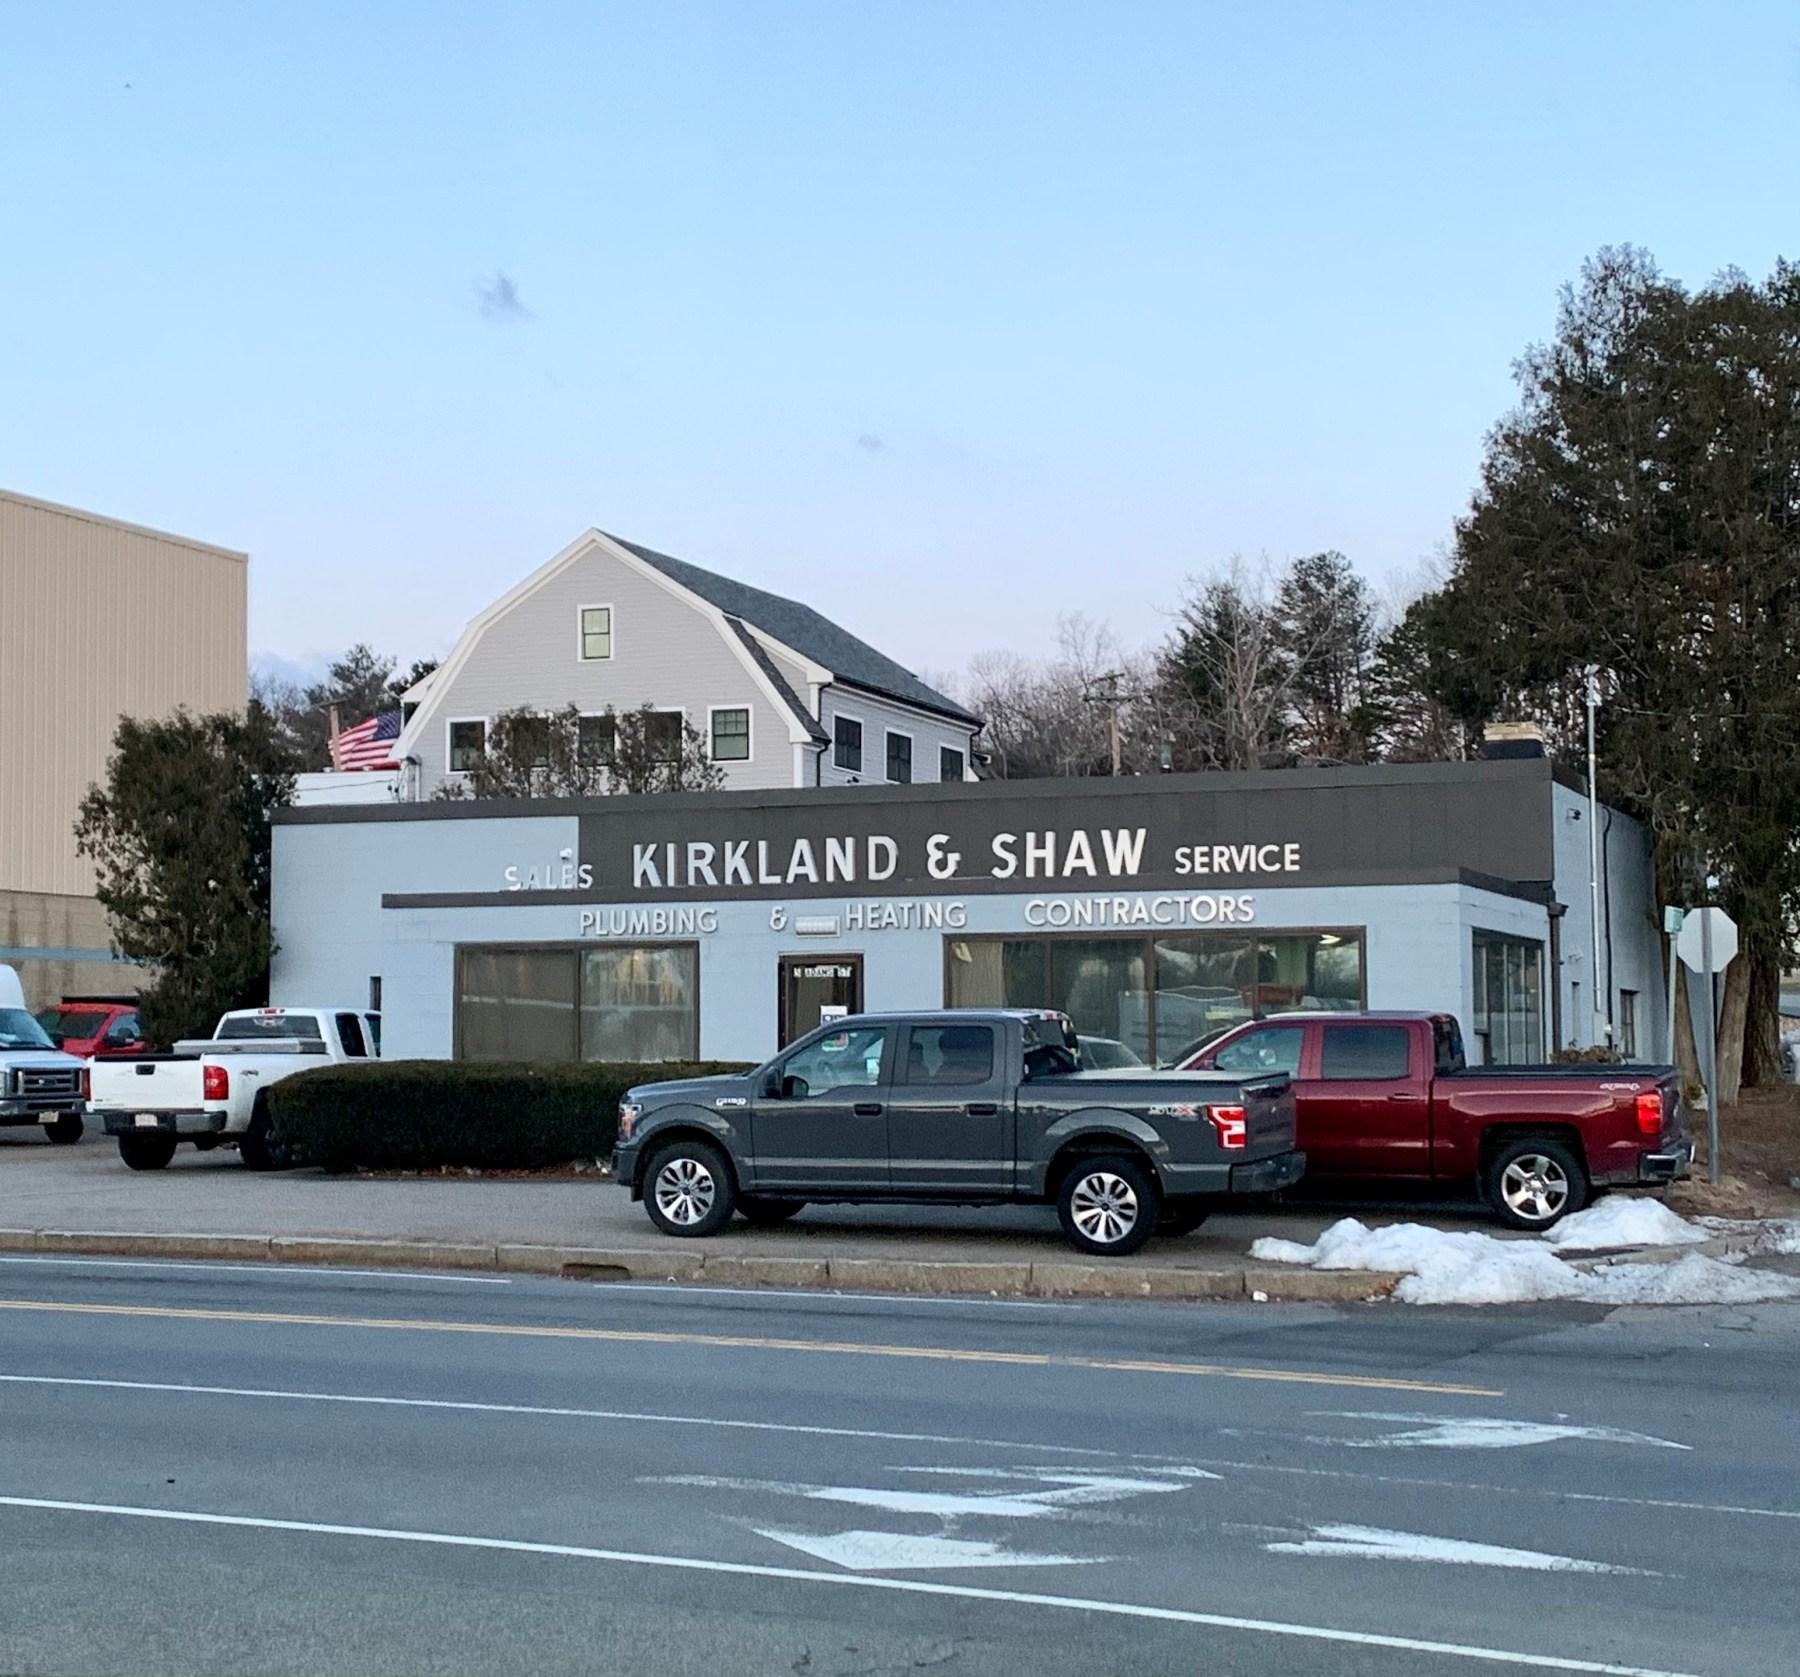 Kirkland & Shaw, 5 Adams Street, Burlington, MA